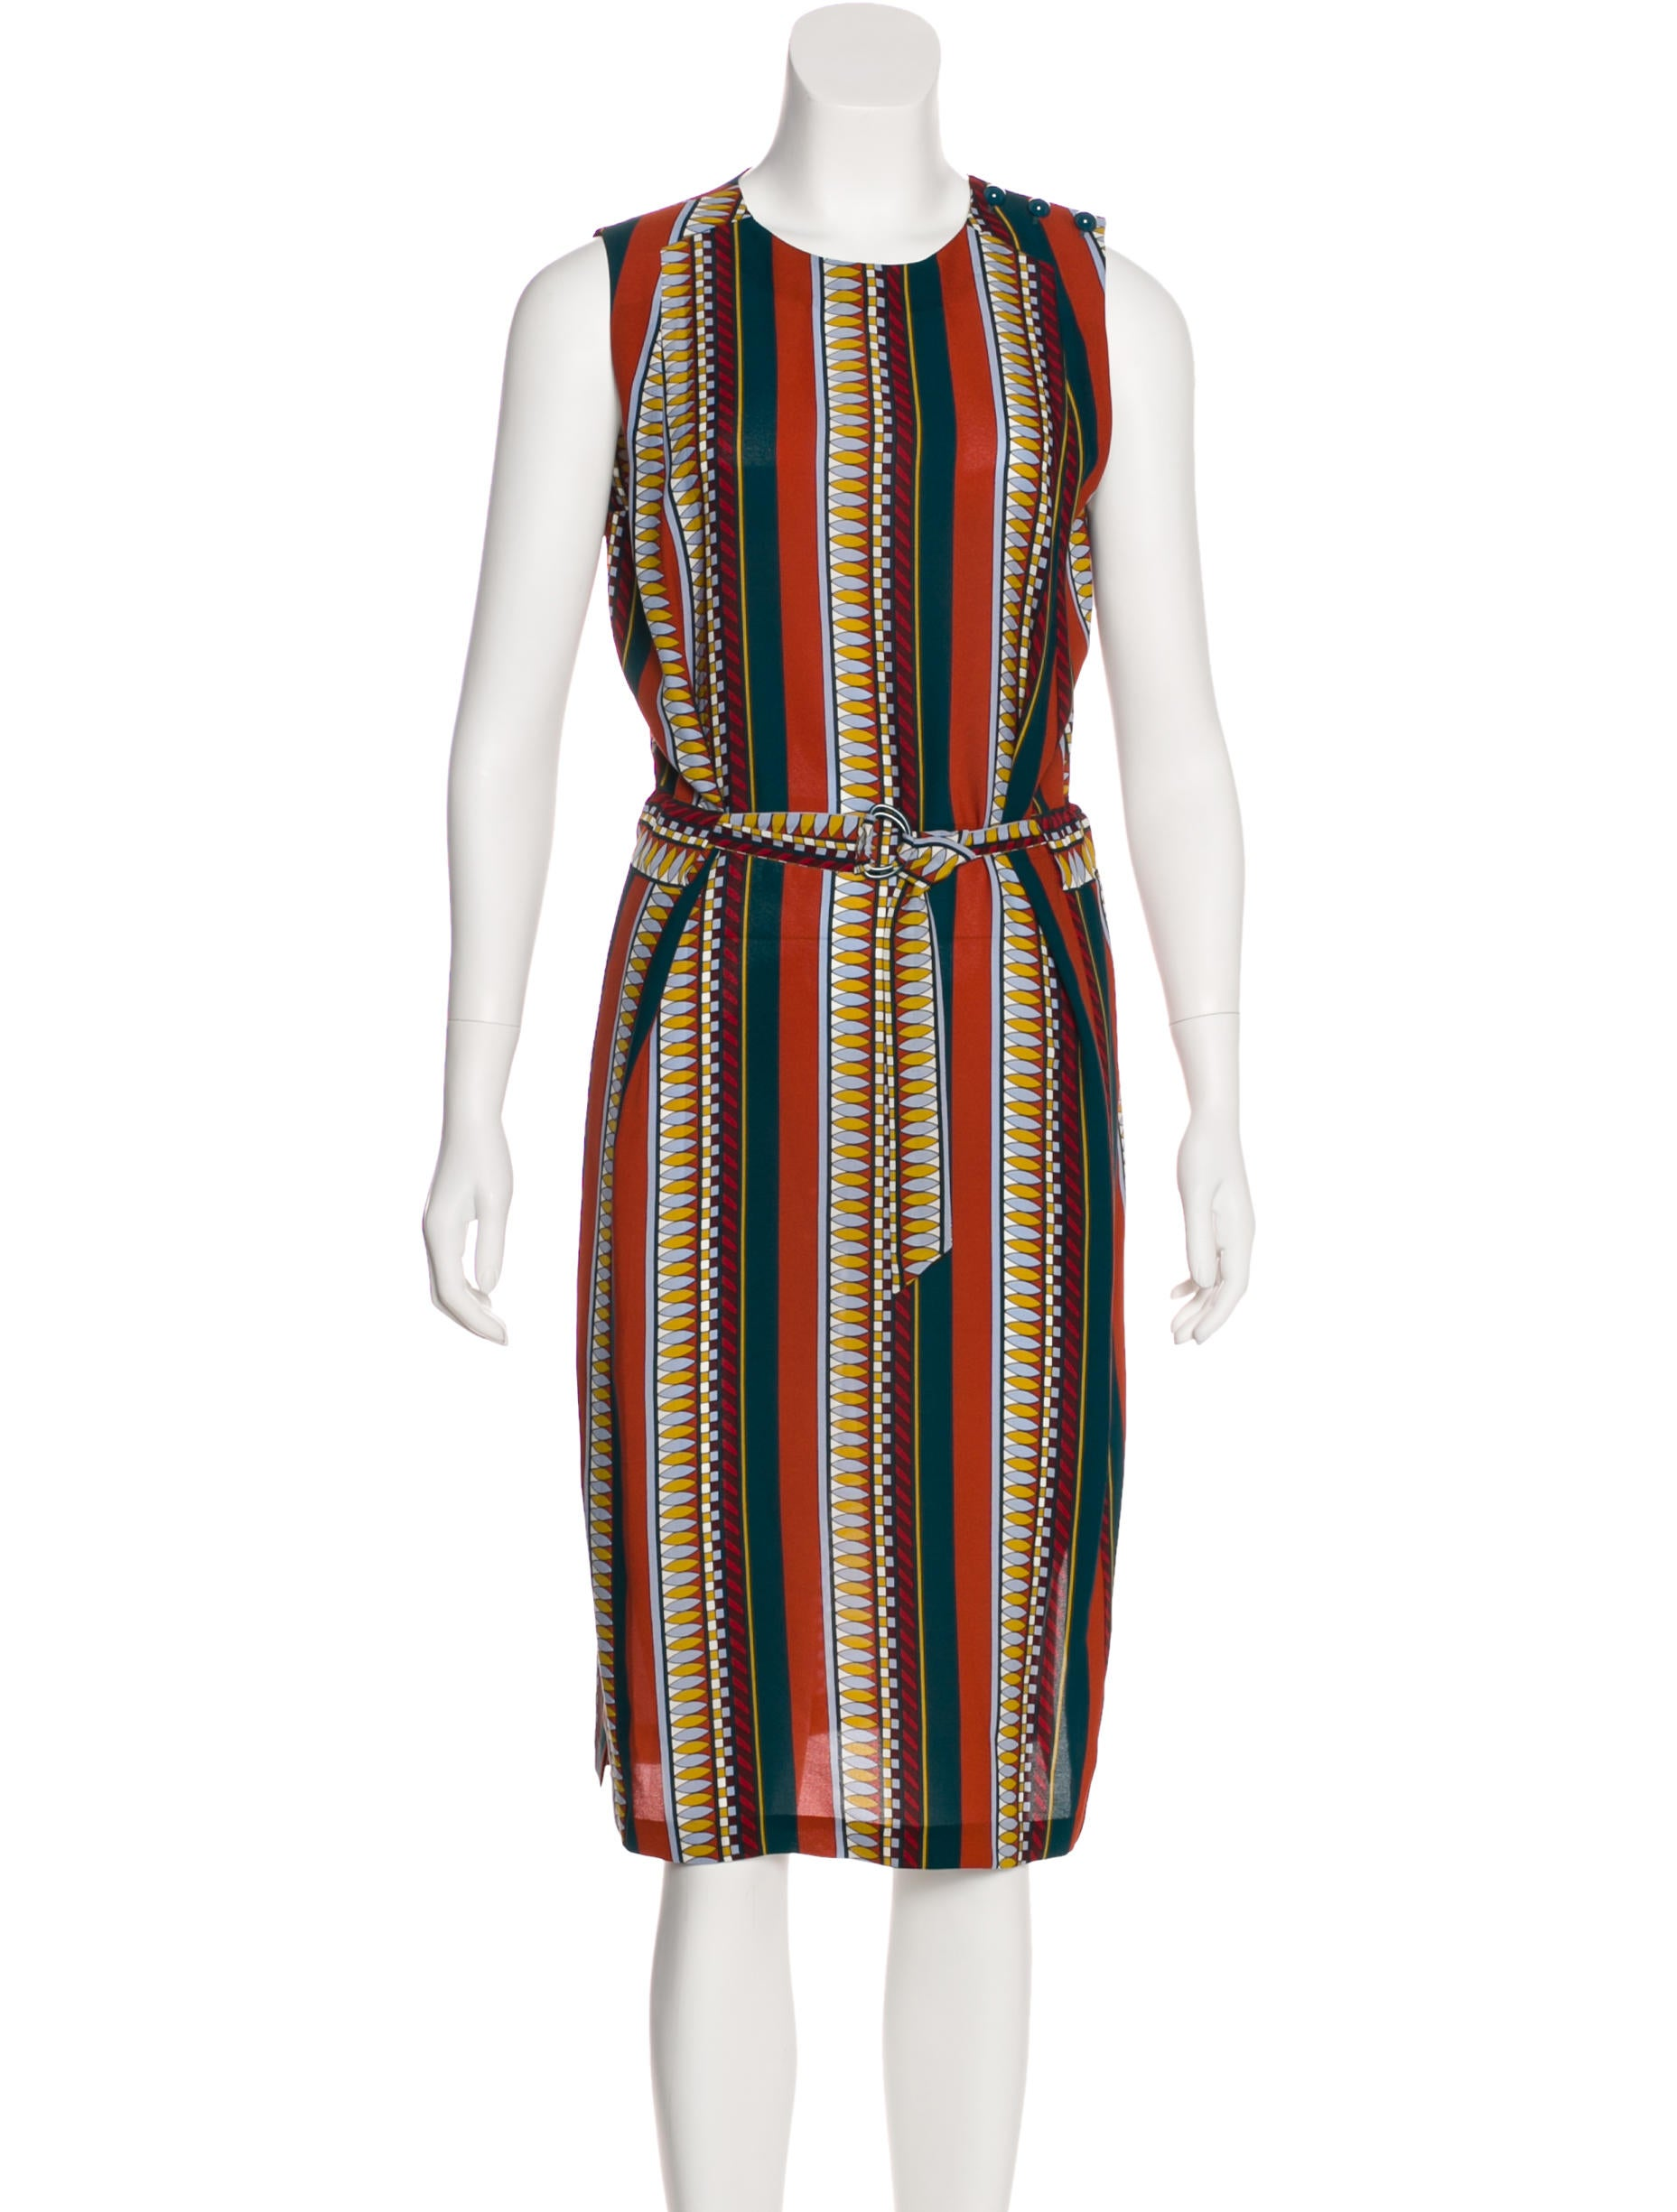 fa279f51ceb Tory Burch Silk Midi Dress - Clothing - WTO153539